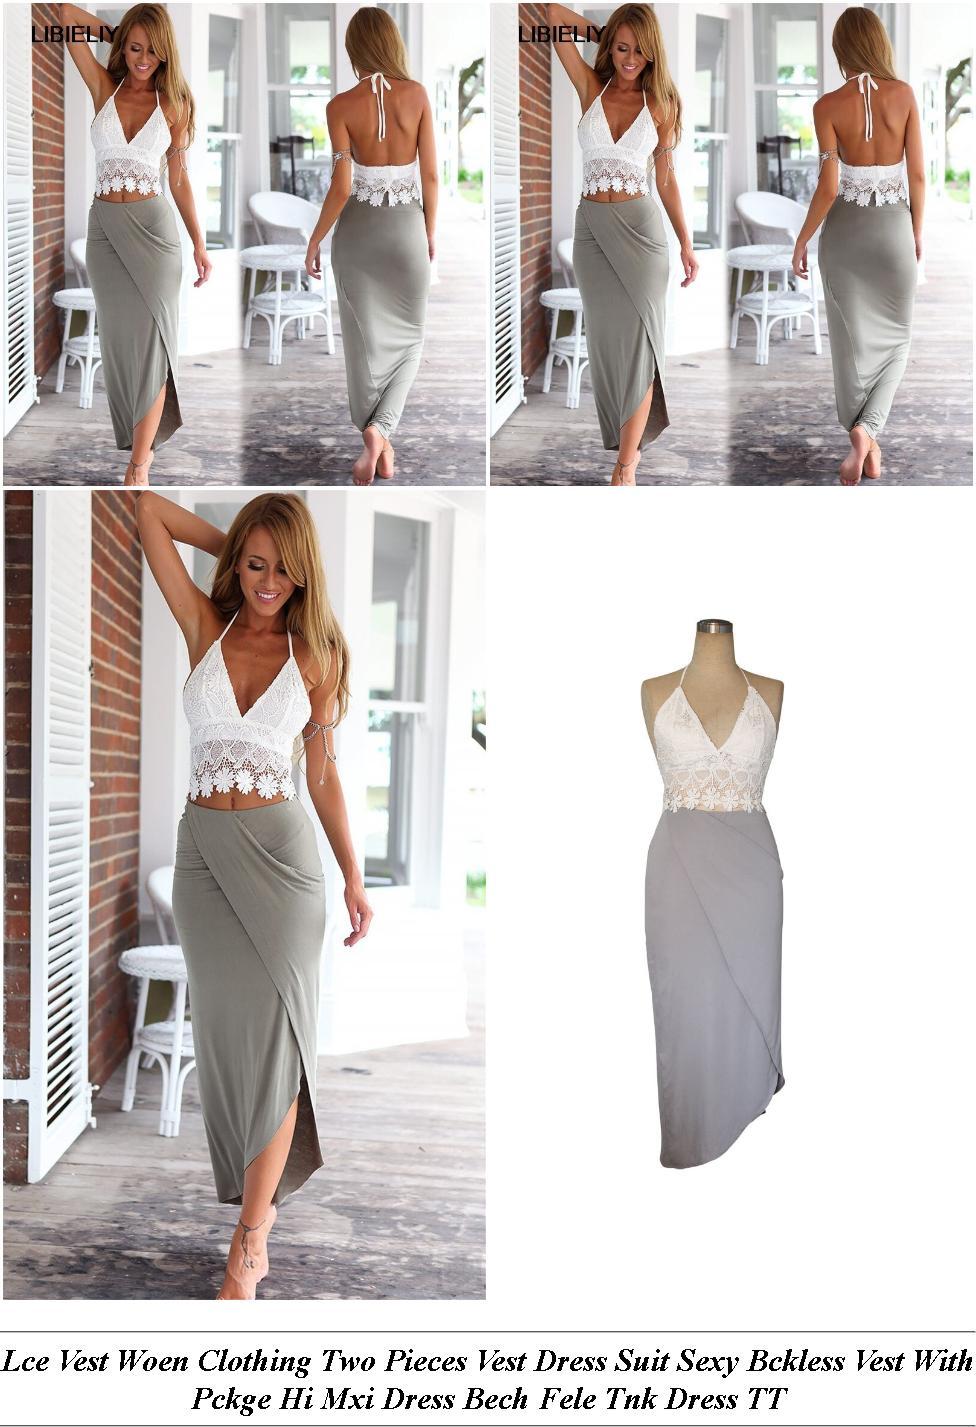 Vintage Prom Dresses Sale - The Vintage Shop Rand Clothing - Lack Tie Event Nyc